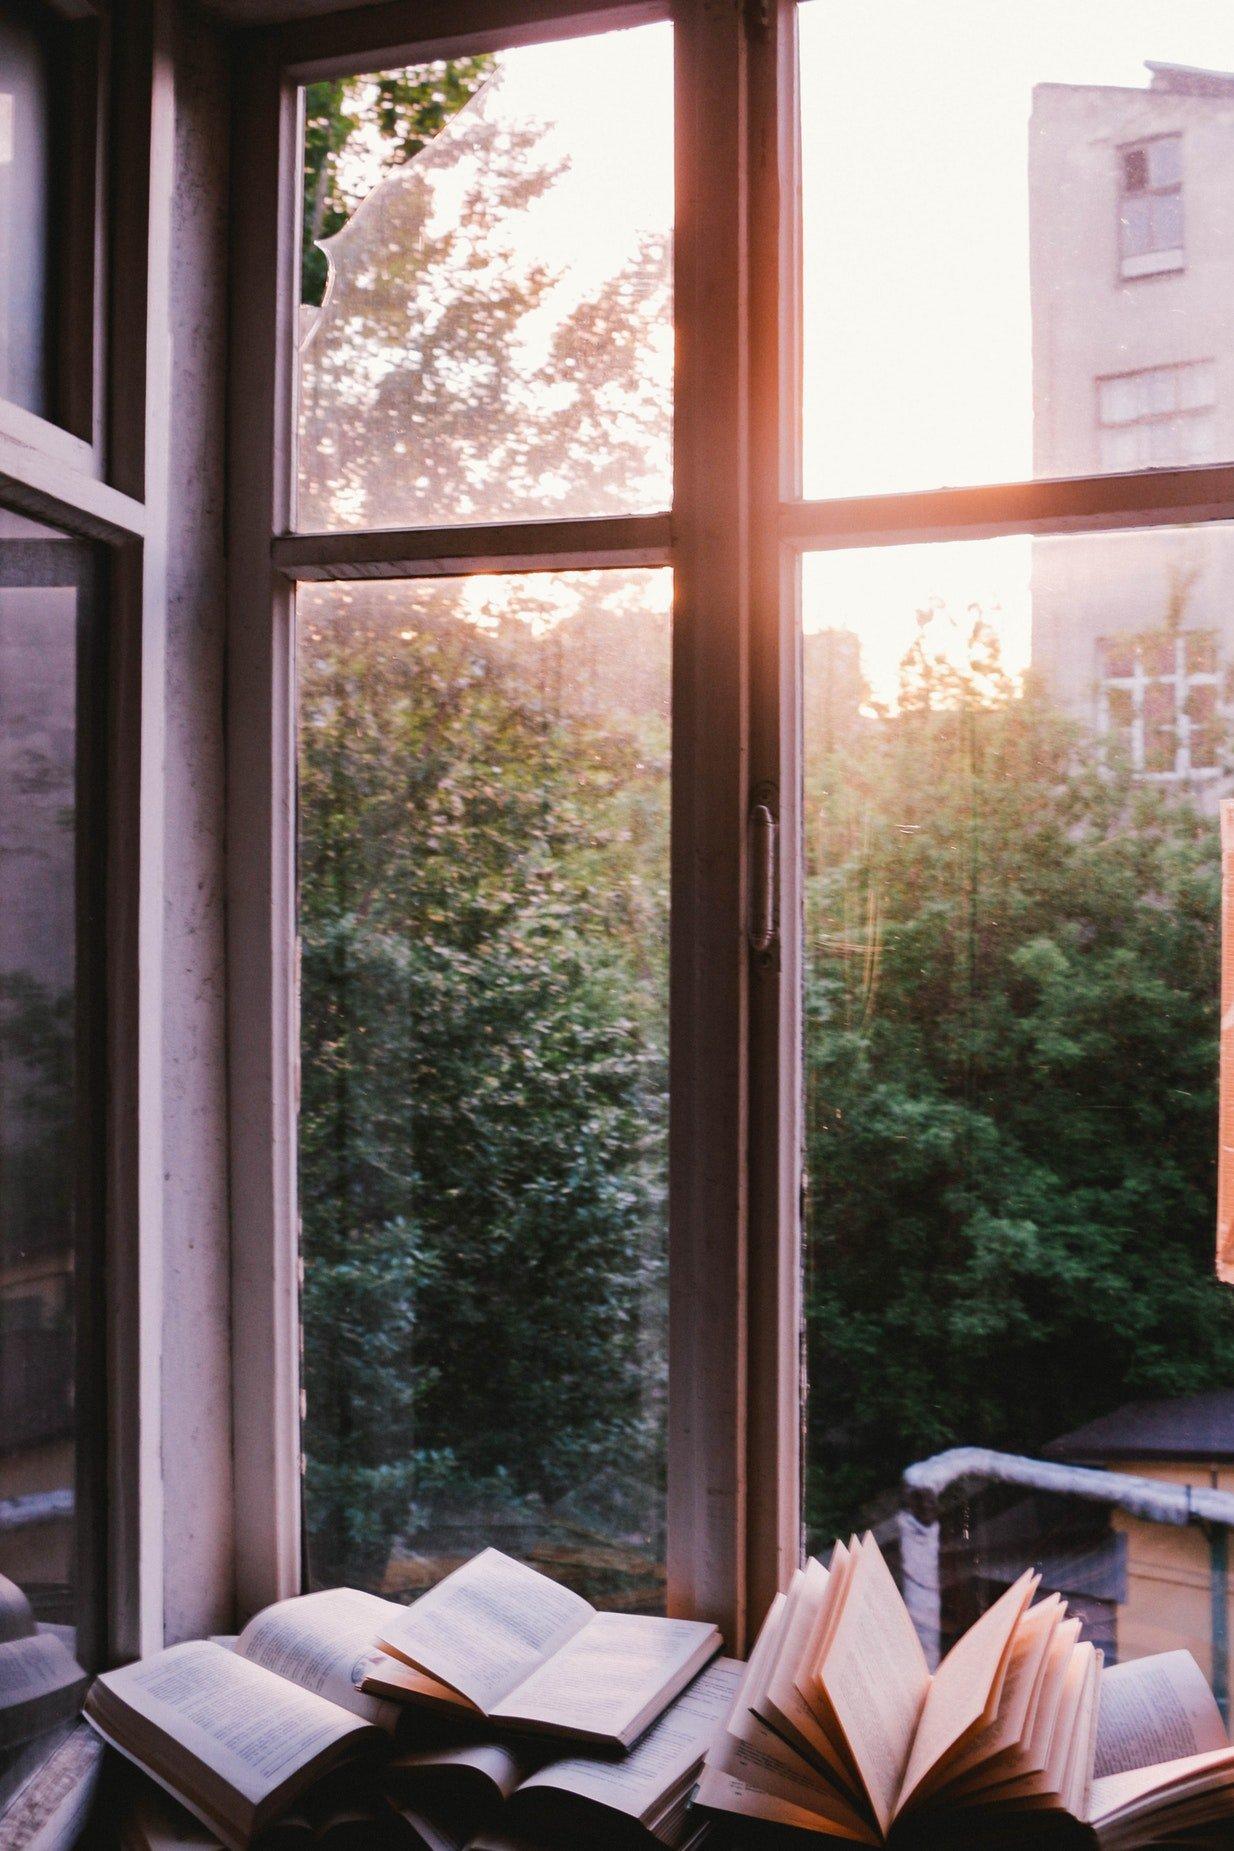 libros-ventana-twitter